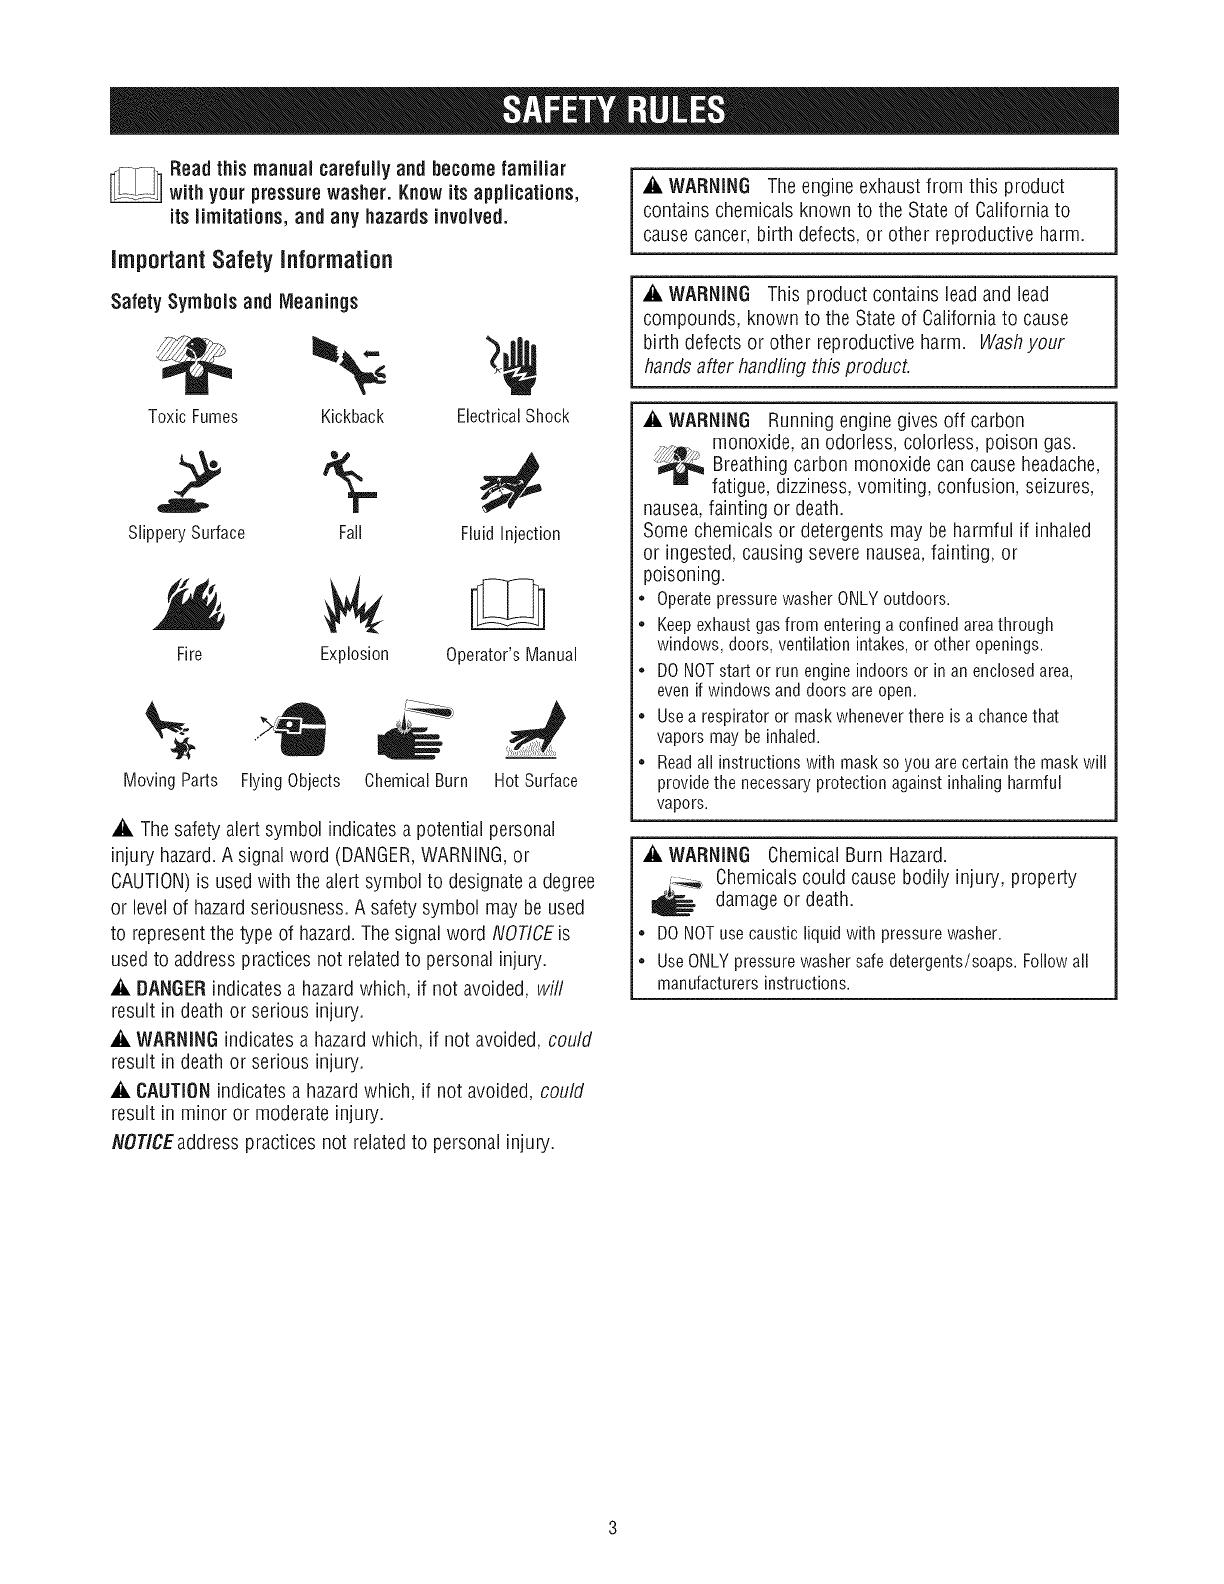 Craftsman 580752531 User Manual PRESSURE WASHER Manuals